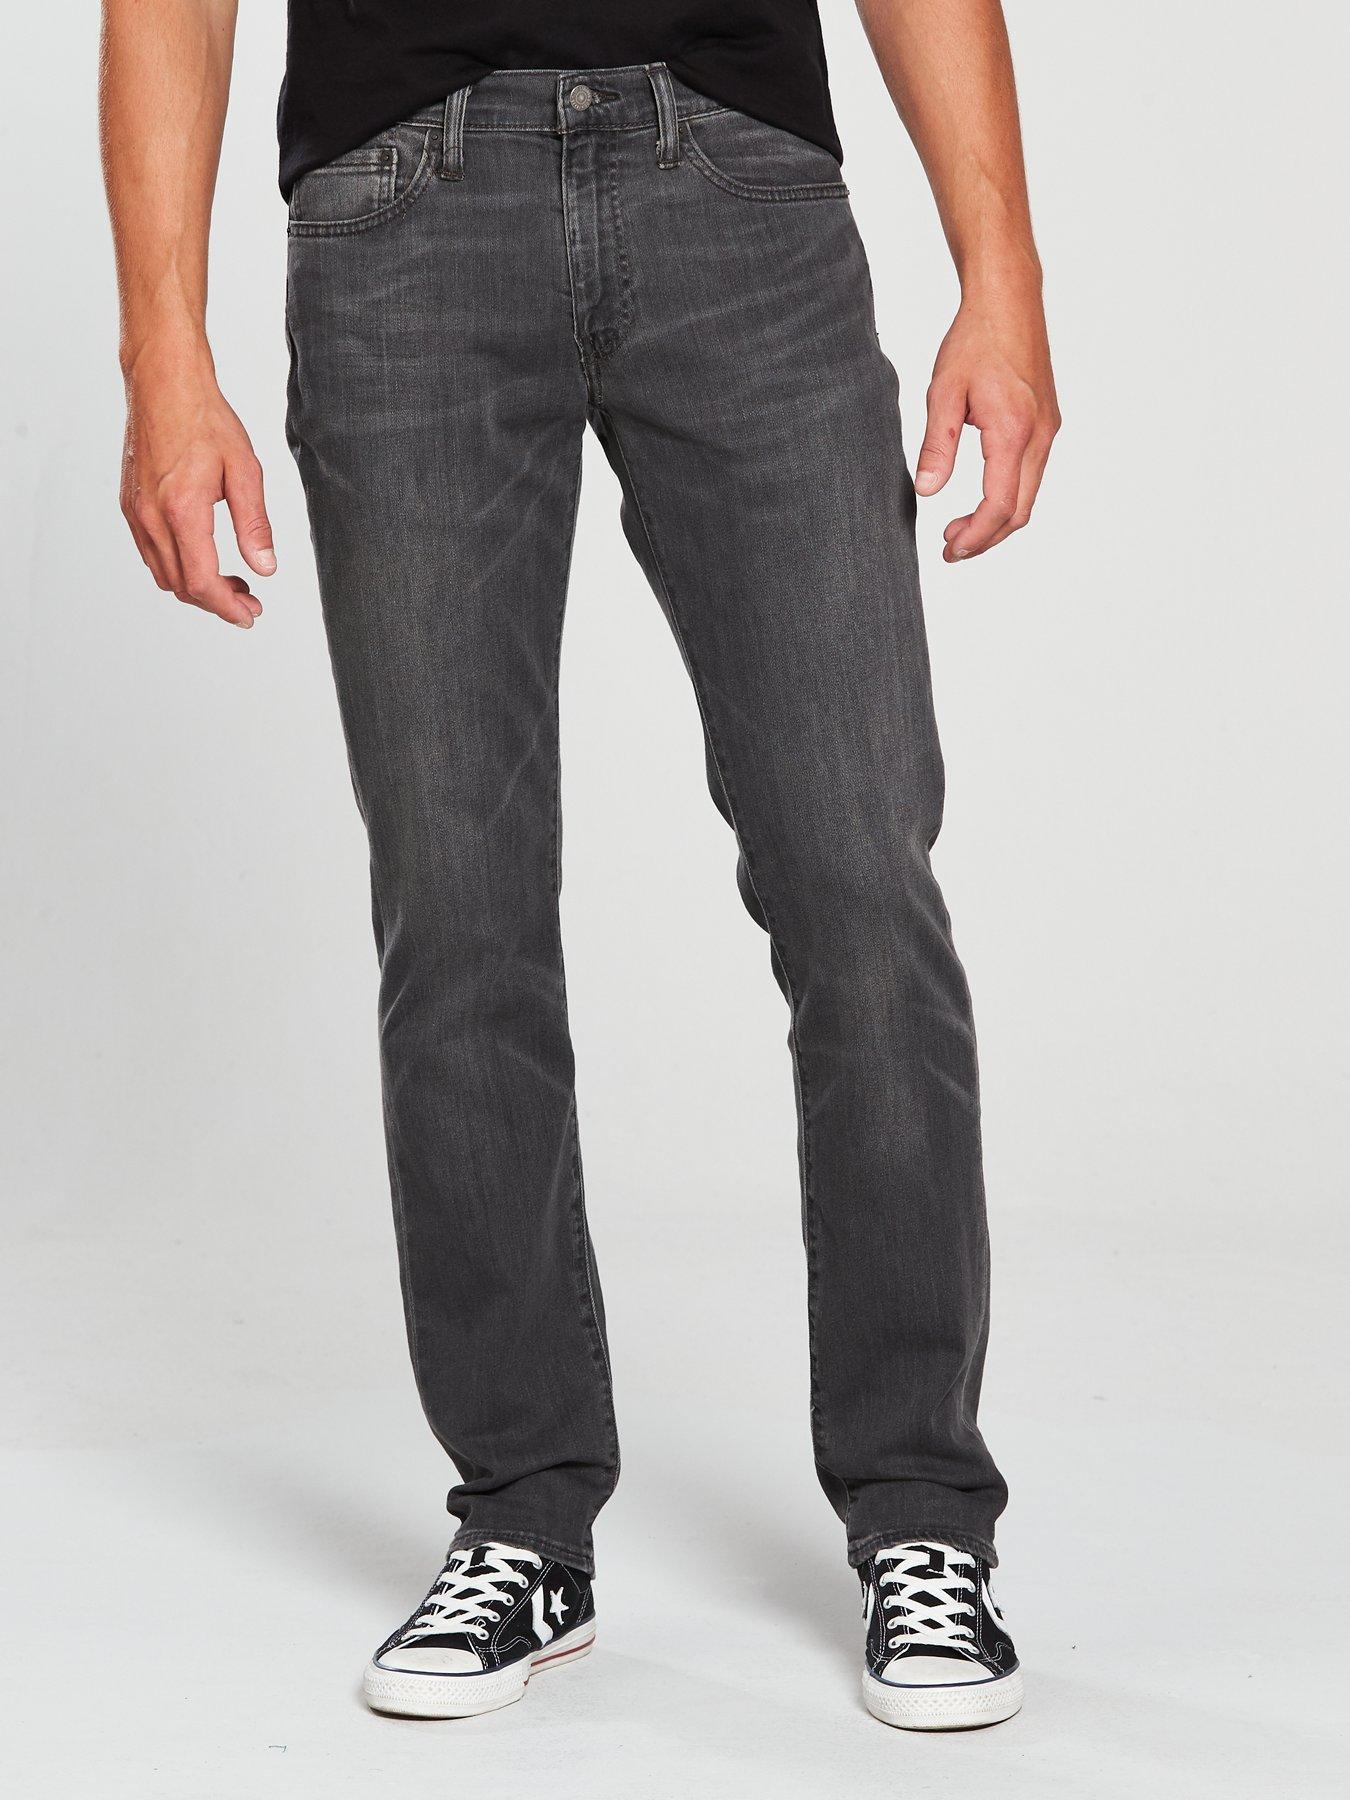 Fit Jeans Men Jeans GreySlim GreySlim Fit GreySlim Men dxeWCrBo